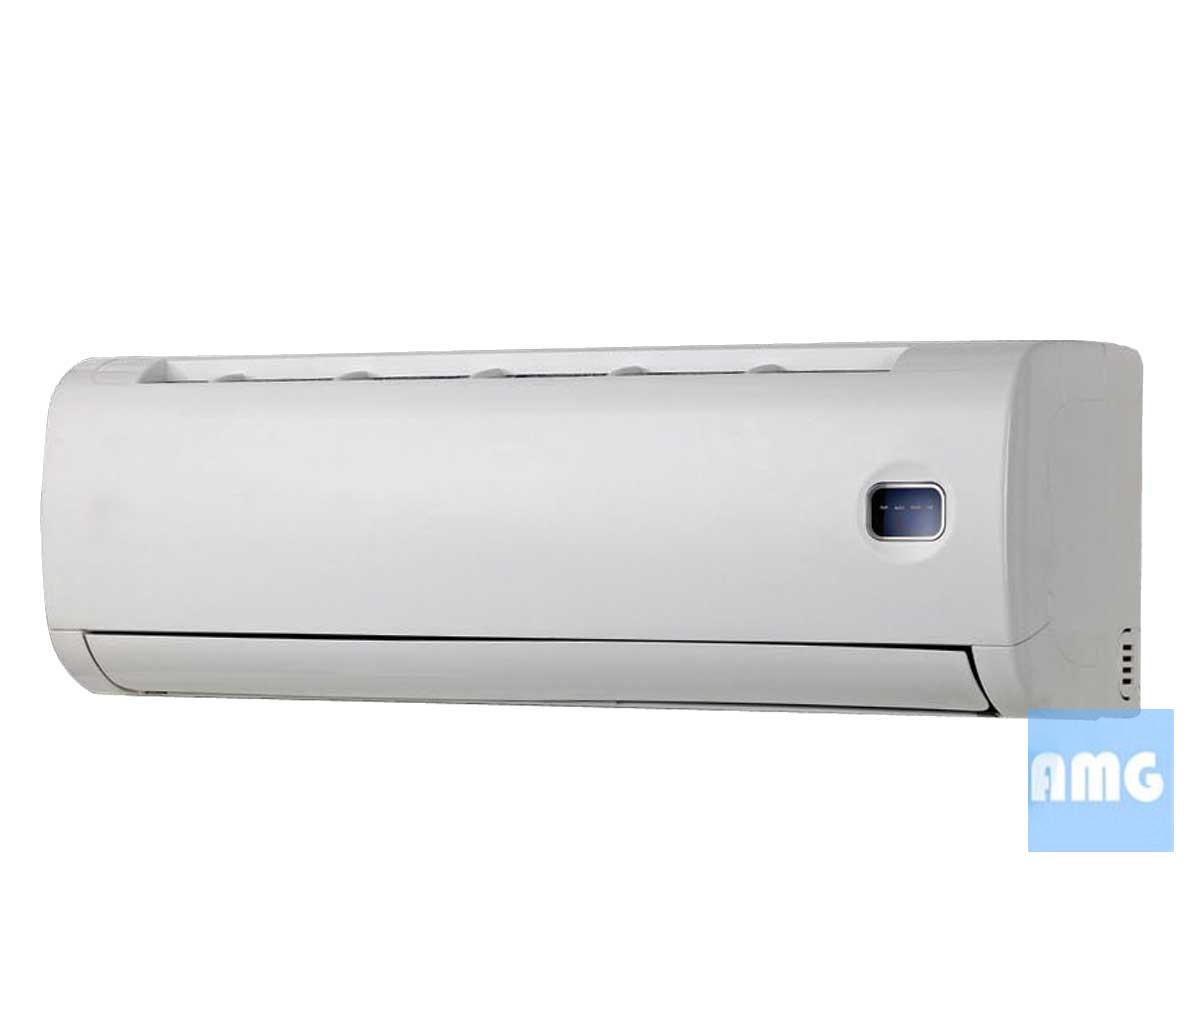 Mini Split Heat Pump Microcreditos Online Pregnancy